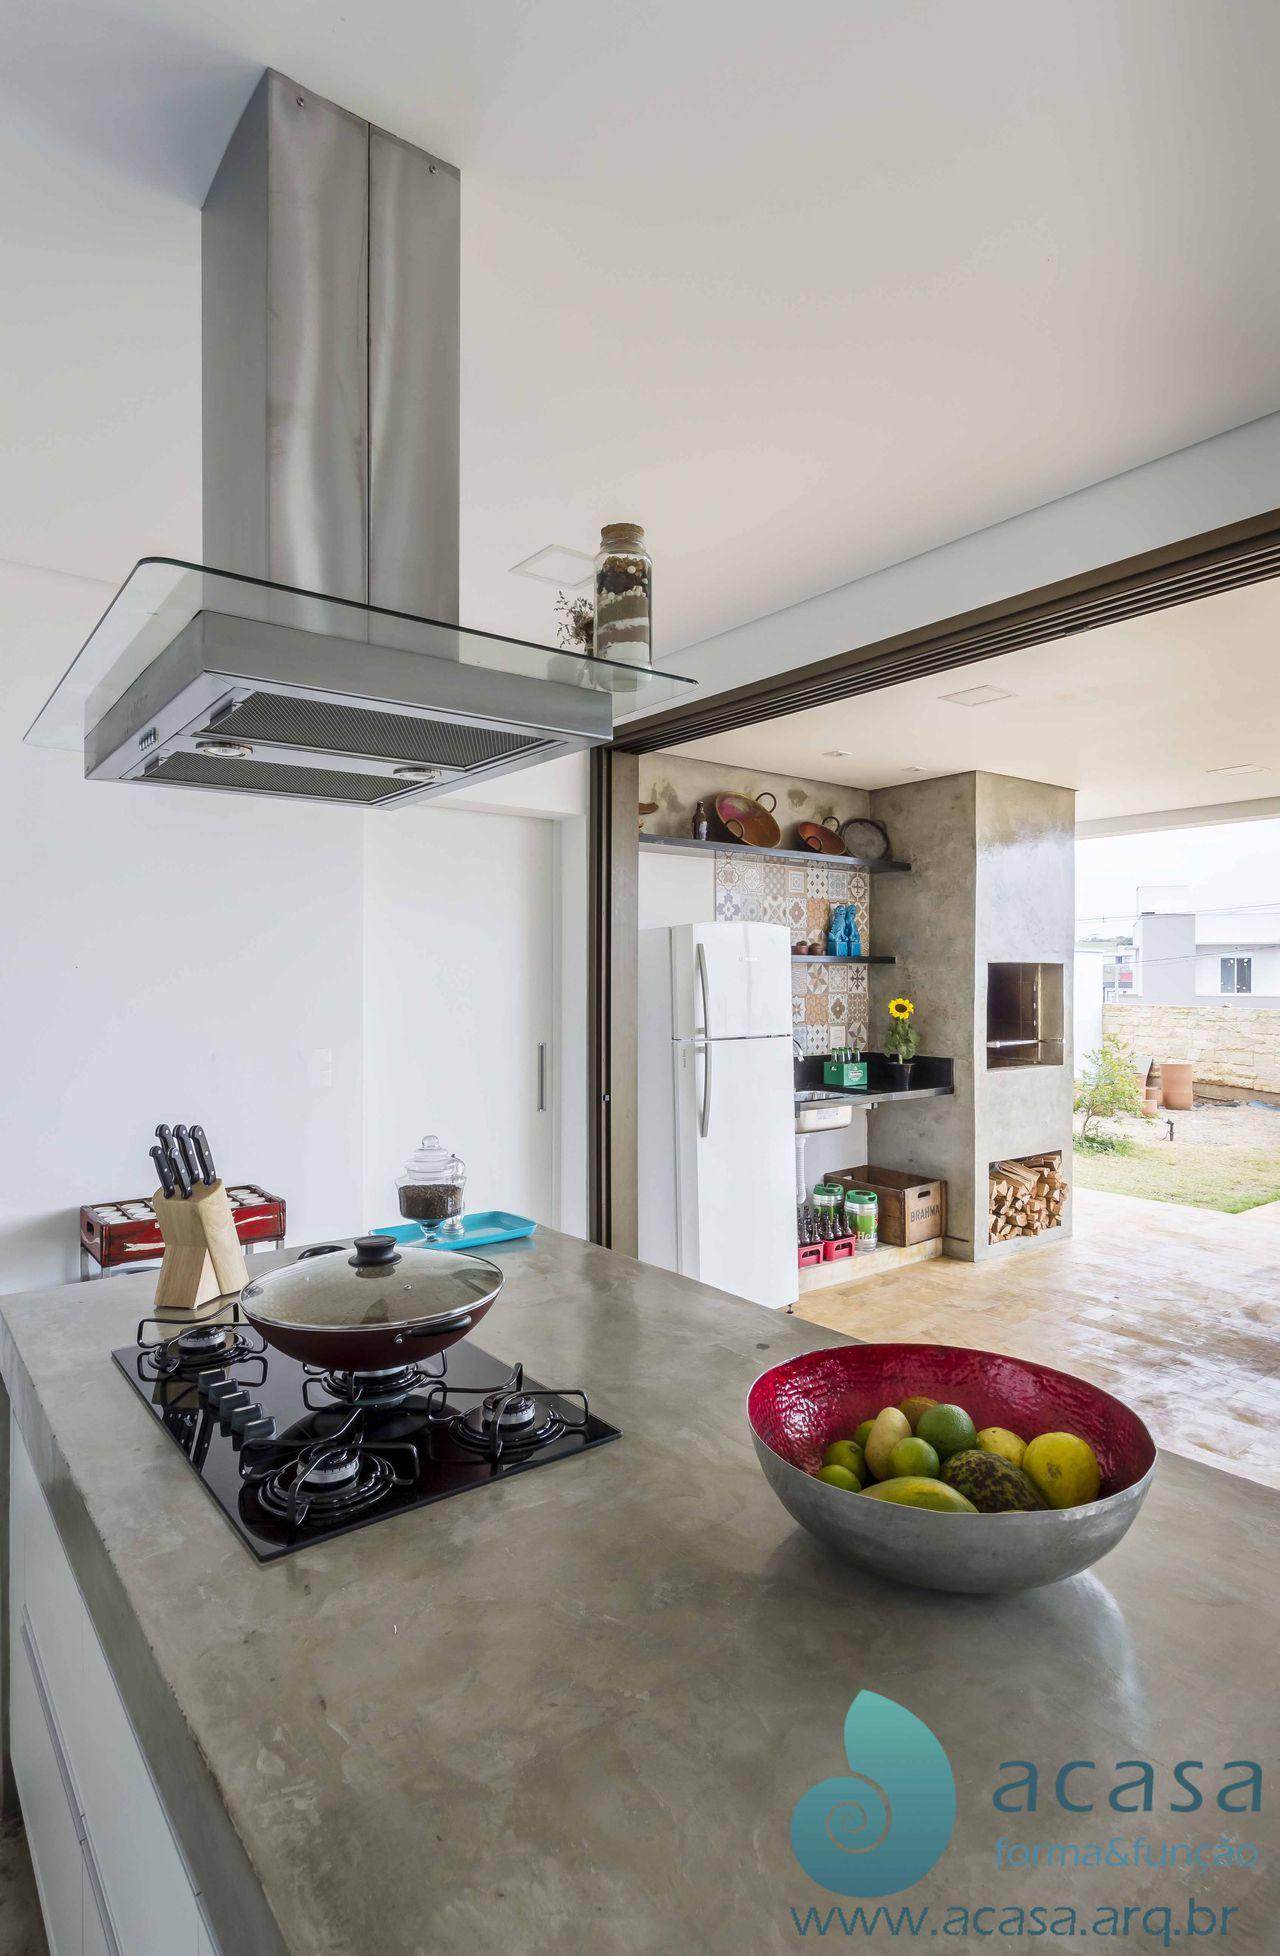 Cozinha E Churrasqueira Integradas De Acasa Forma Fun O 137763 No